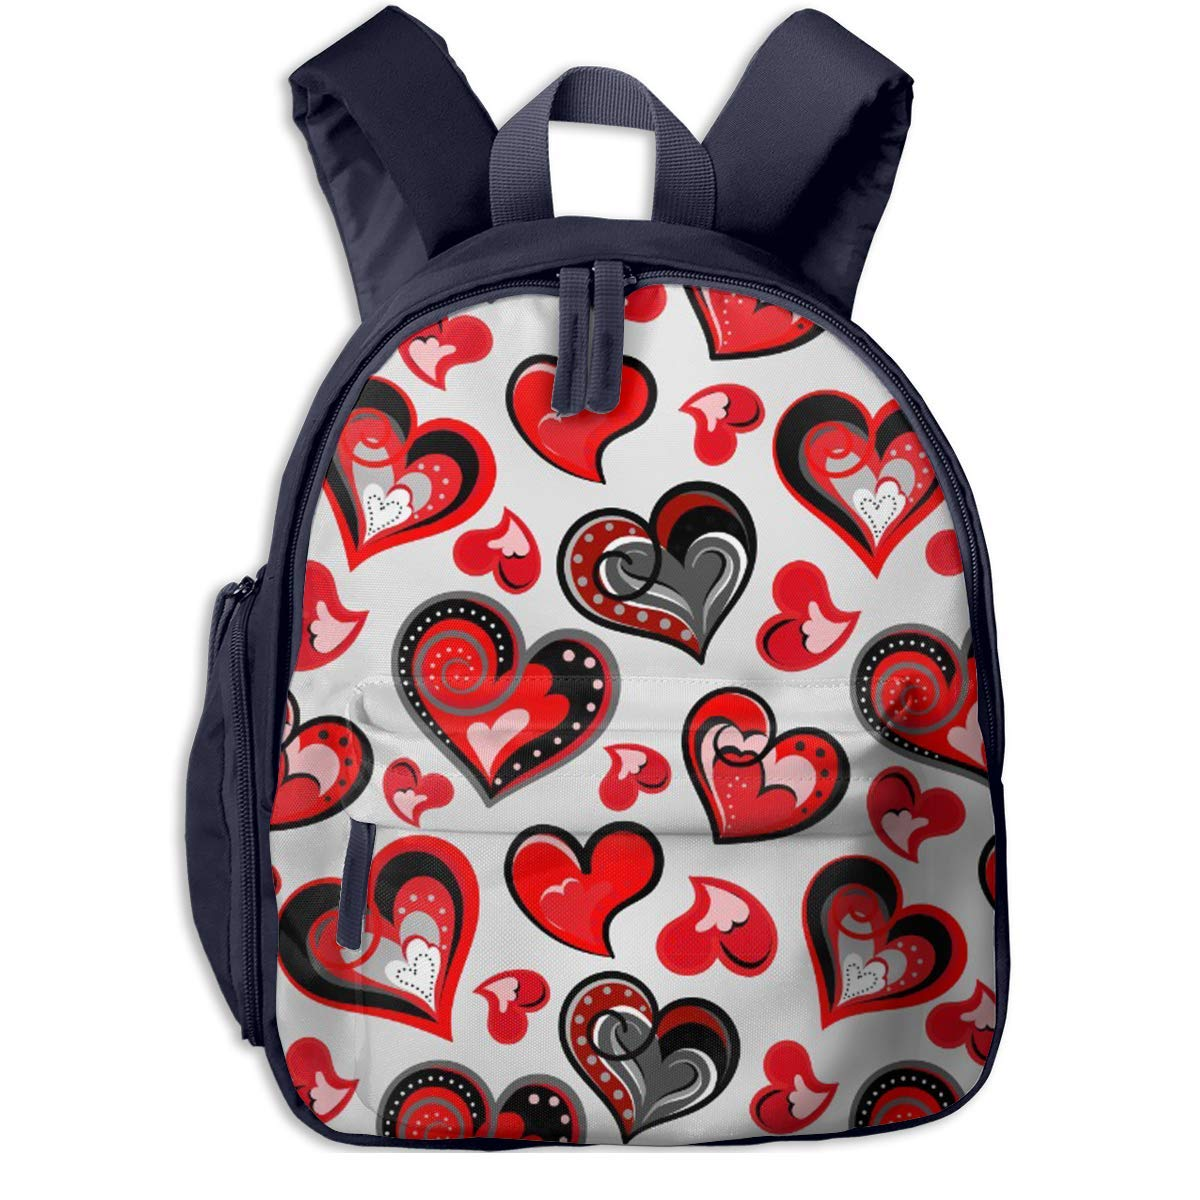 Sd4r5y3hg School Backpack for Girls Boys, Kids Cute Cute Cute rot schwarz Heart Cartoon Backpacks Book Bag B07MGSRWQQ Daypacks Ausgezeichnete Funktion 8a3051